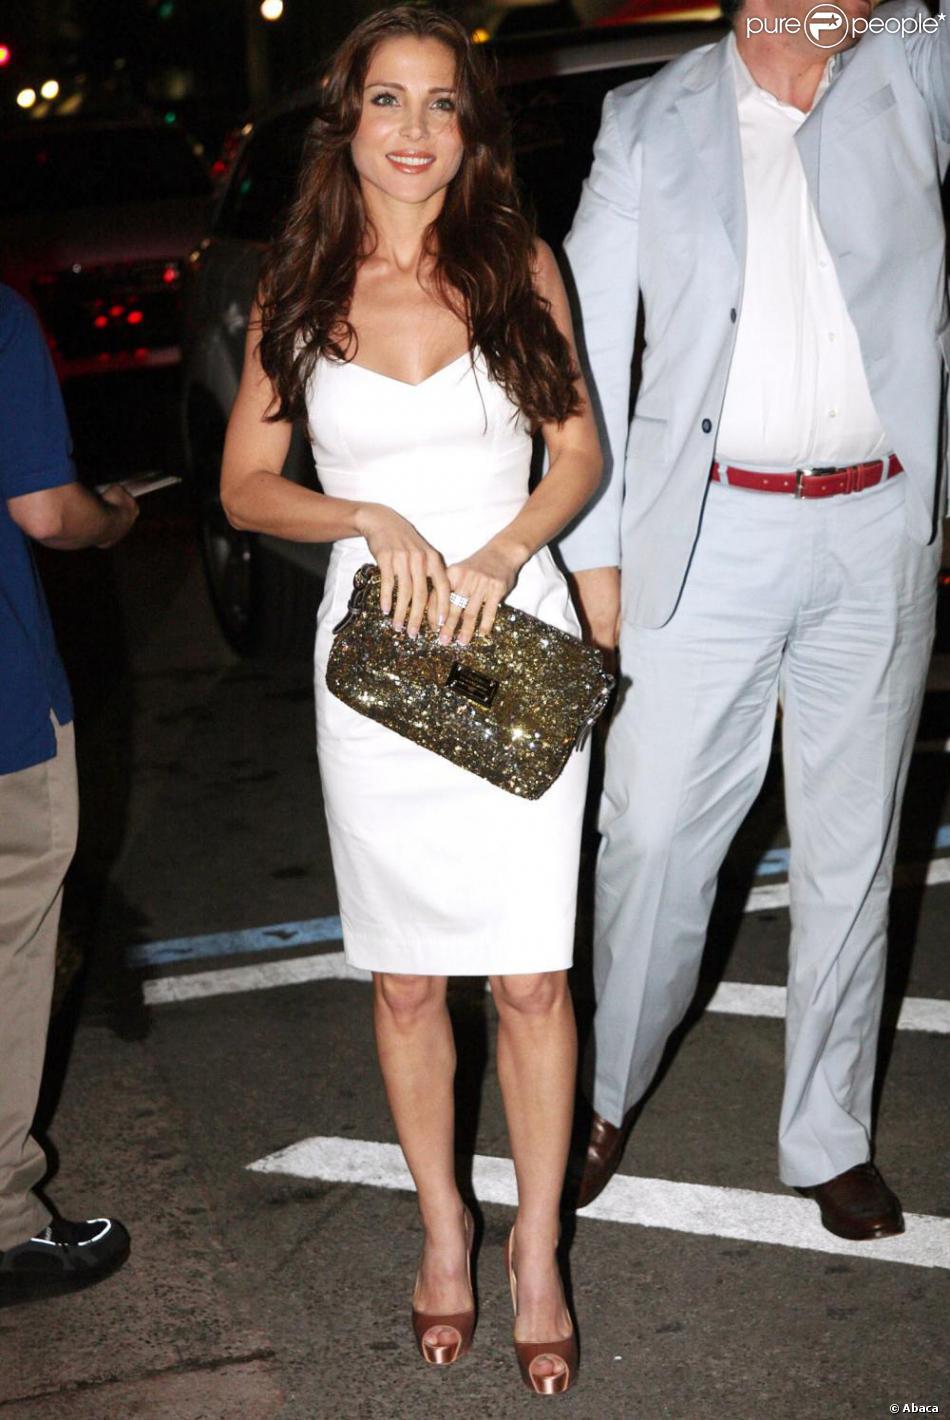 – Site Chaussures Blanche Avec Femme Mode Robe Populaire De N8nw0OPkZX